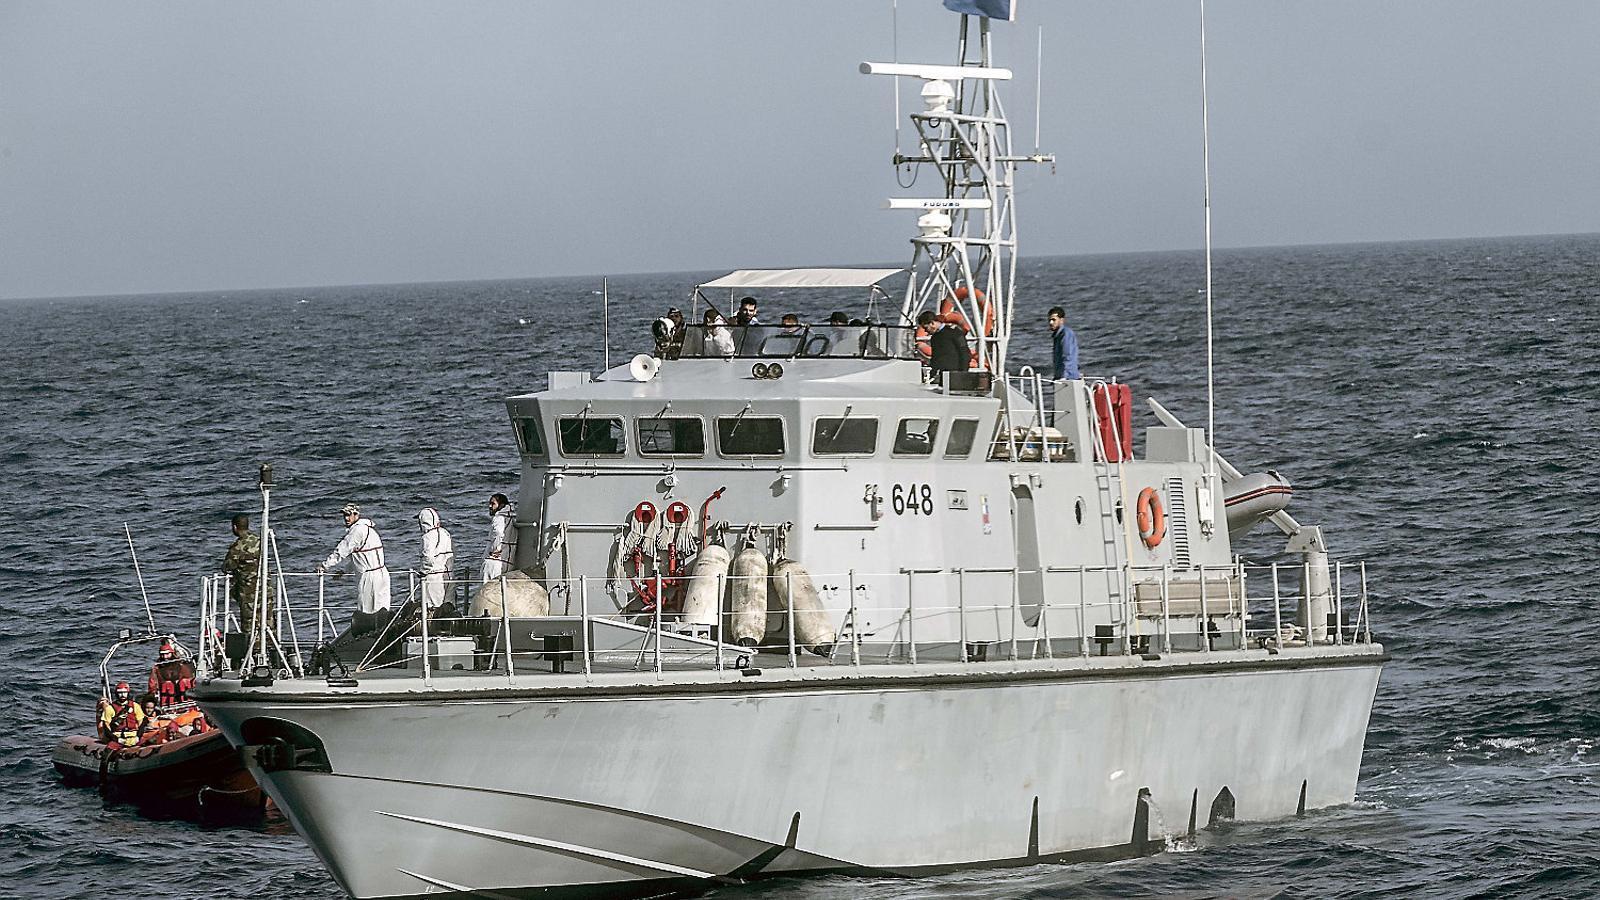 La UE delega en Líbia el control migratori